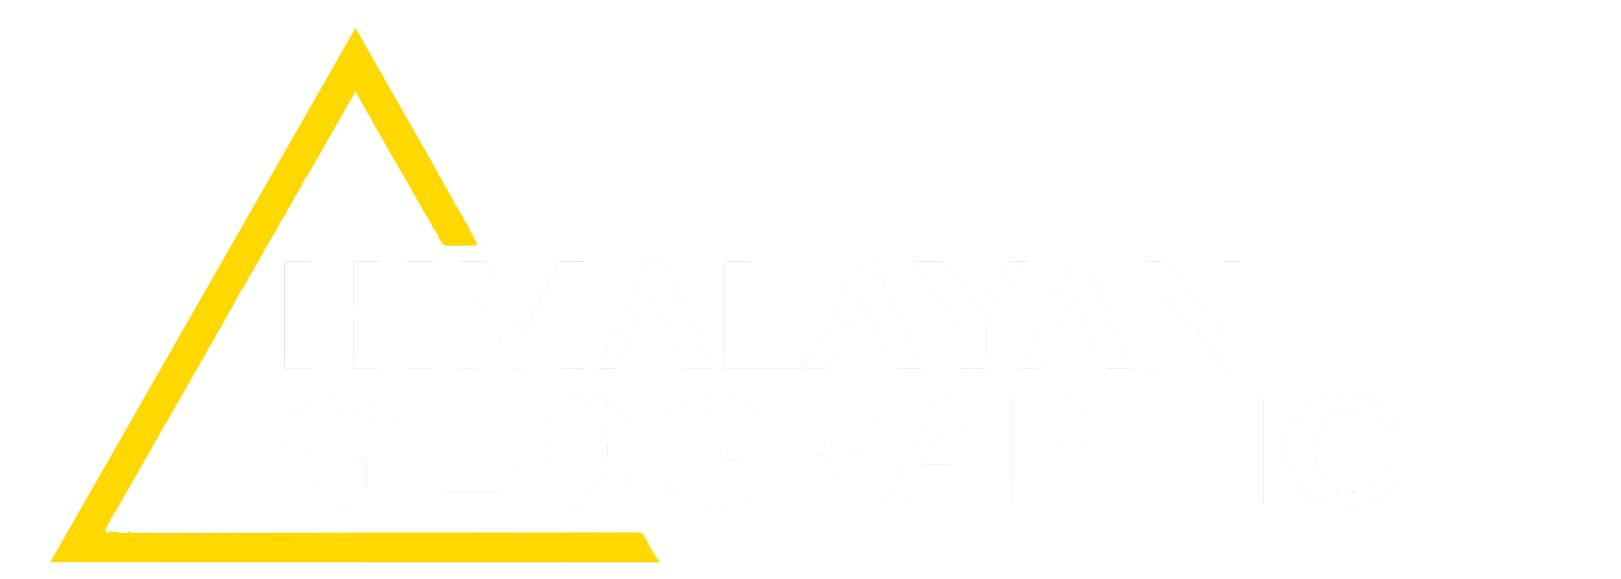 Himalayan Geographic